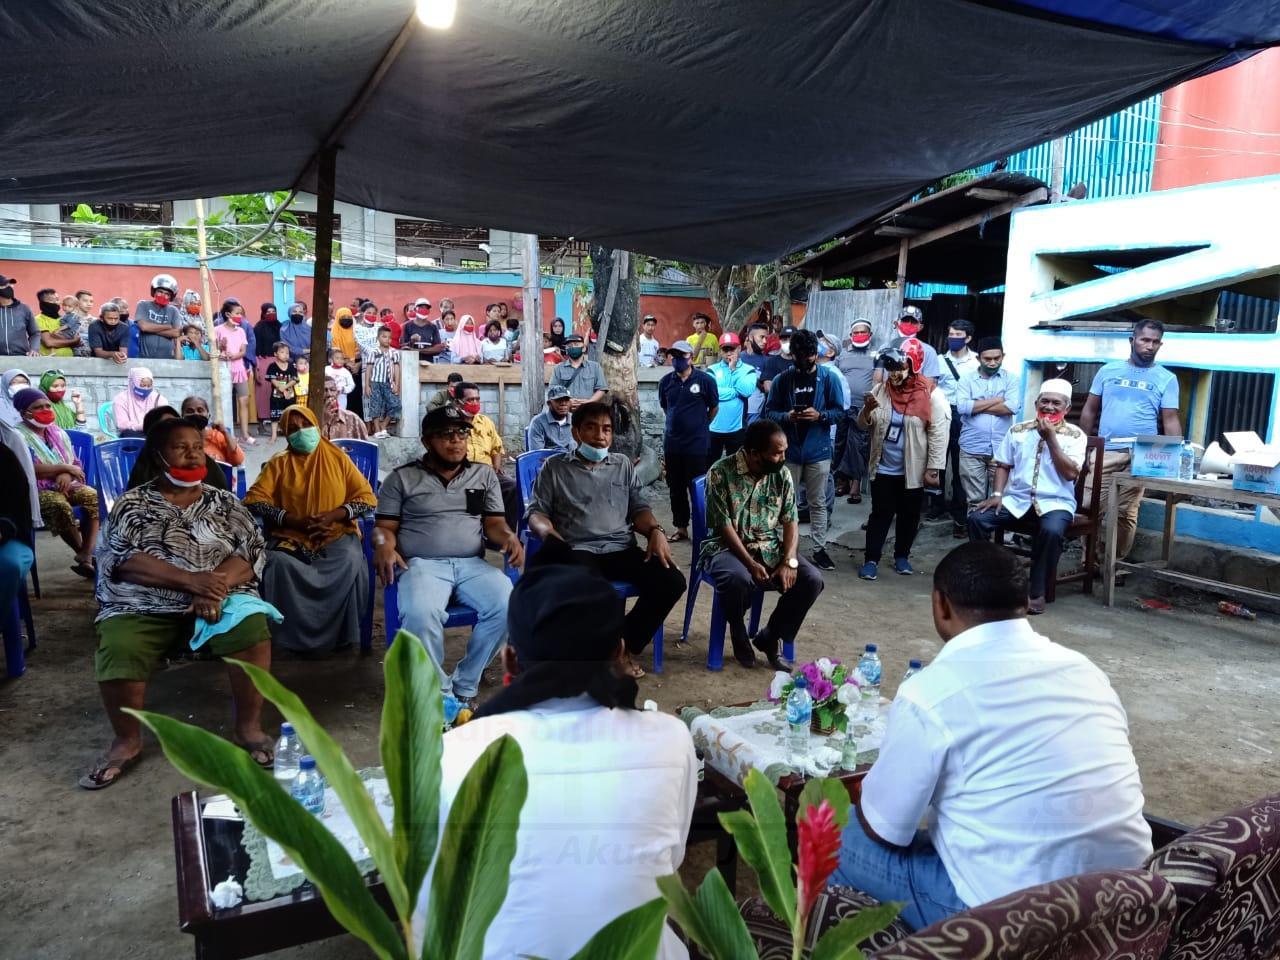 Komunitas Nelayan Borobudur Nyatakan Dukung HEBO di Pilkada Manokwari 2020 17 IMG 20201003 WA0007